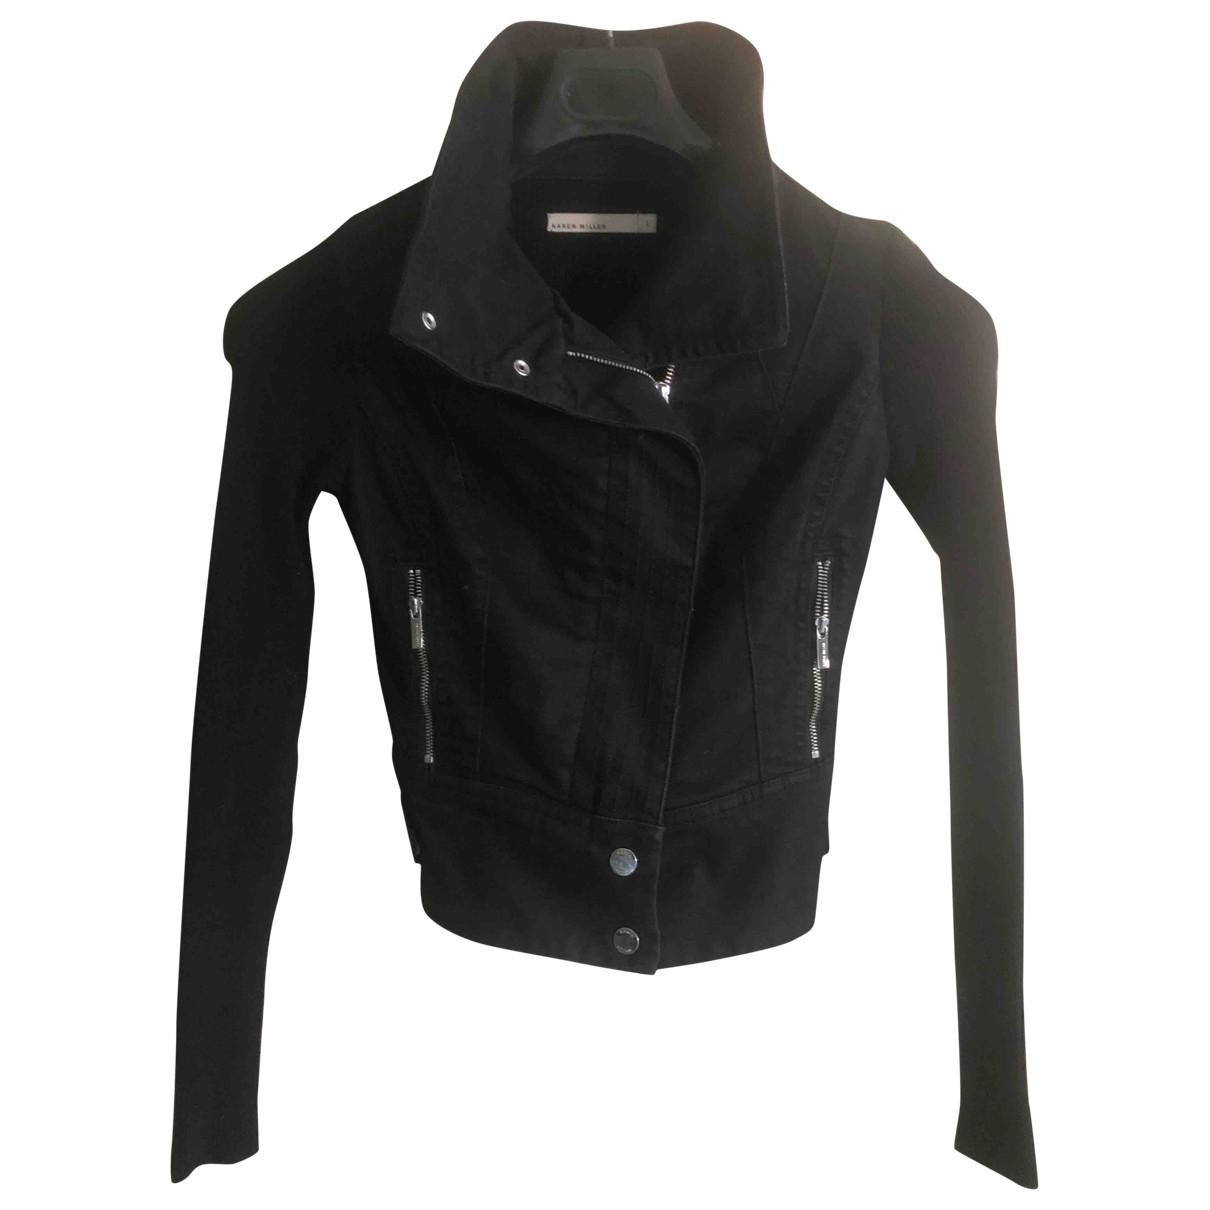 Karen Millen \N Black Denim - Jeans jacket for Women S International